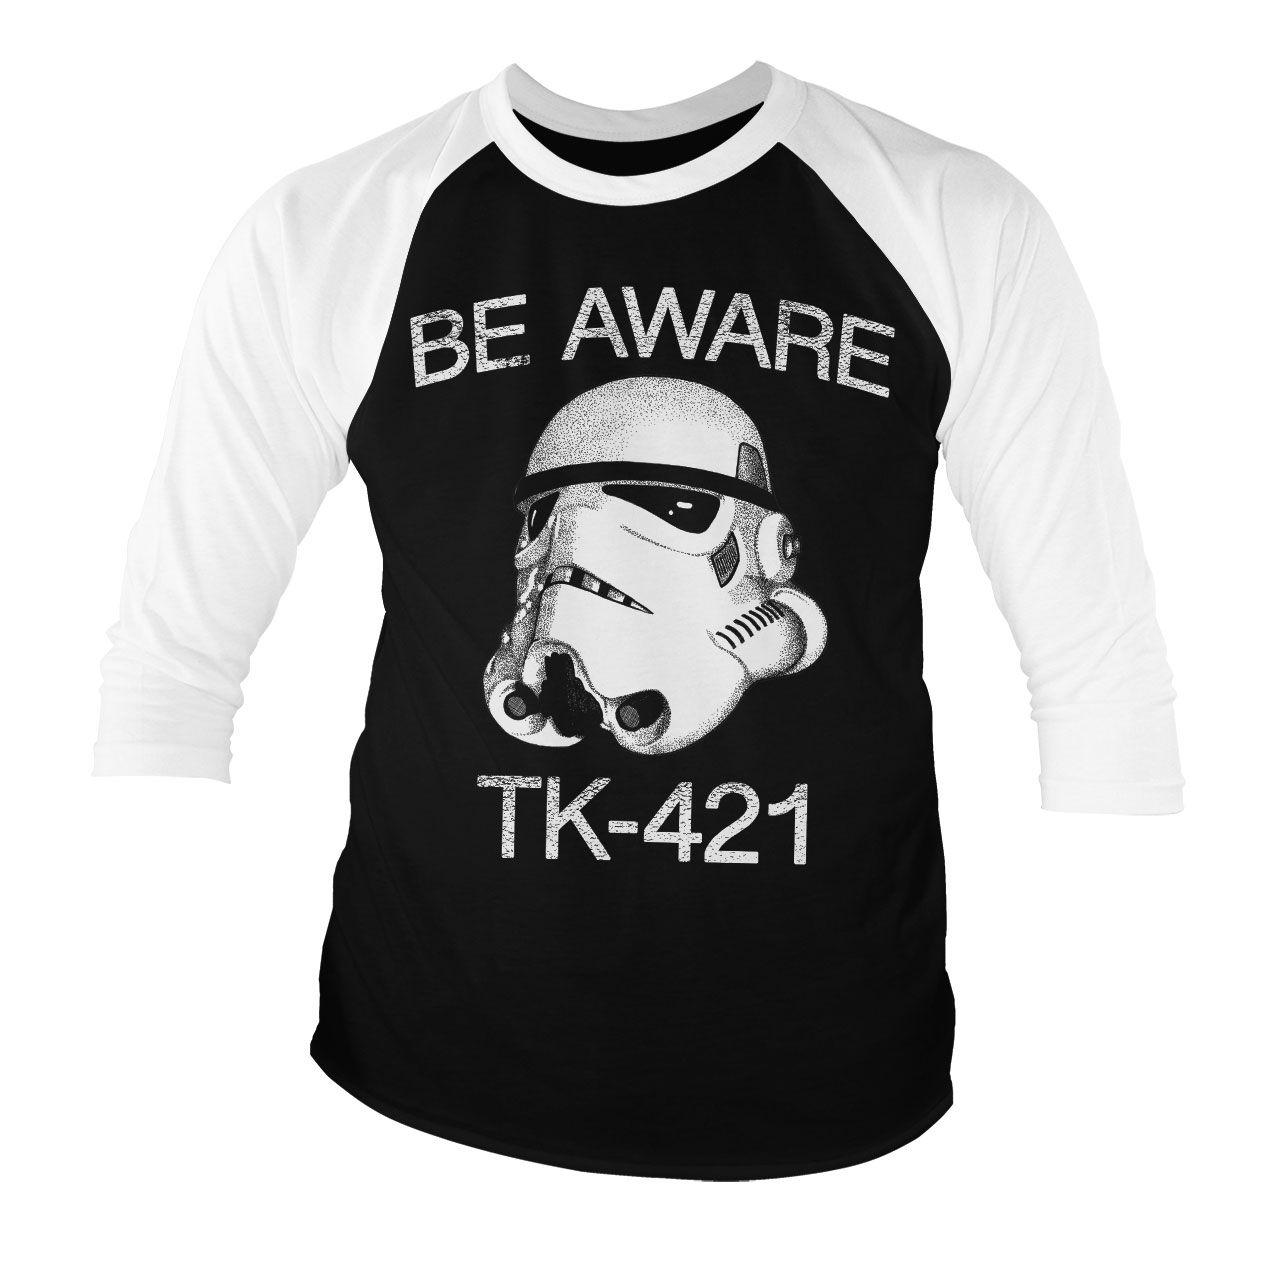 Cheap Sale Fashion Style Discount Footlocker Mens Tk-421 Short Sleeve T-Shirt Star Wars Sunshine Really Cheap Price kL2nH7p8ER